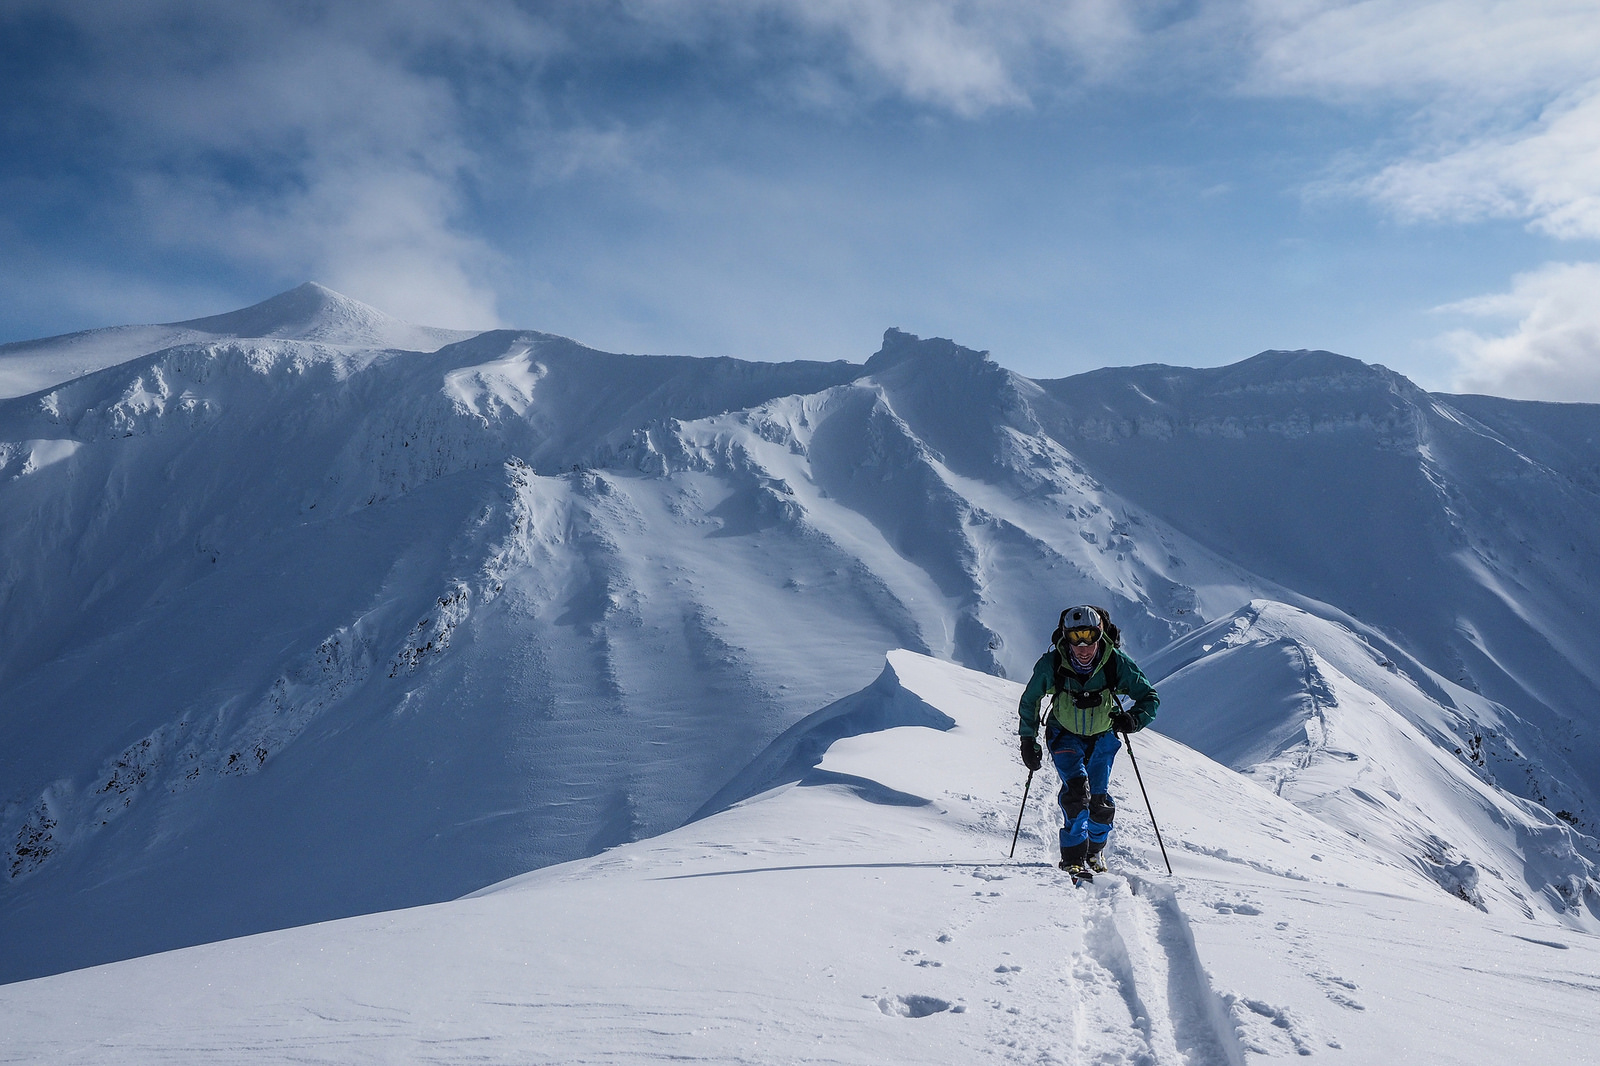 Touring Ski Packs